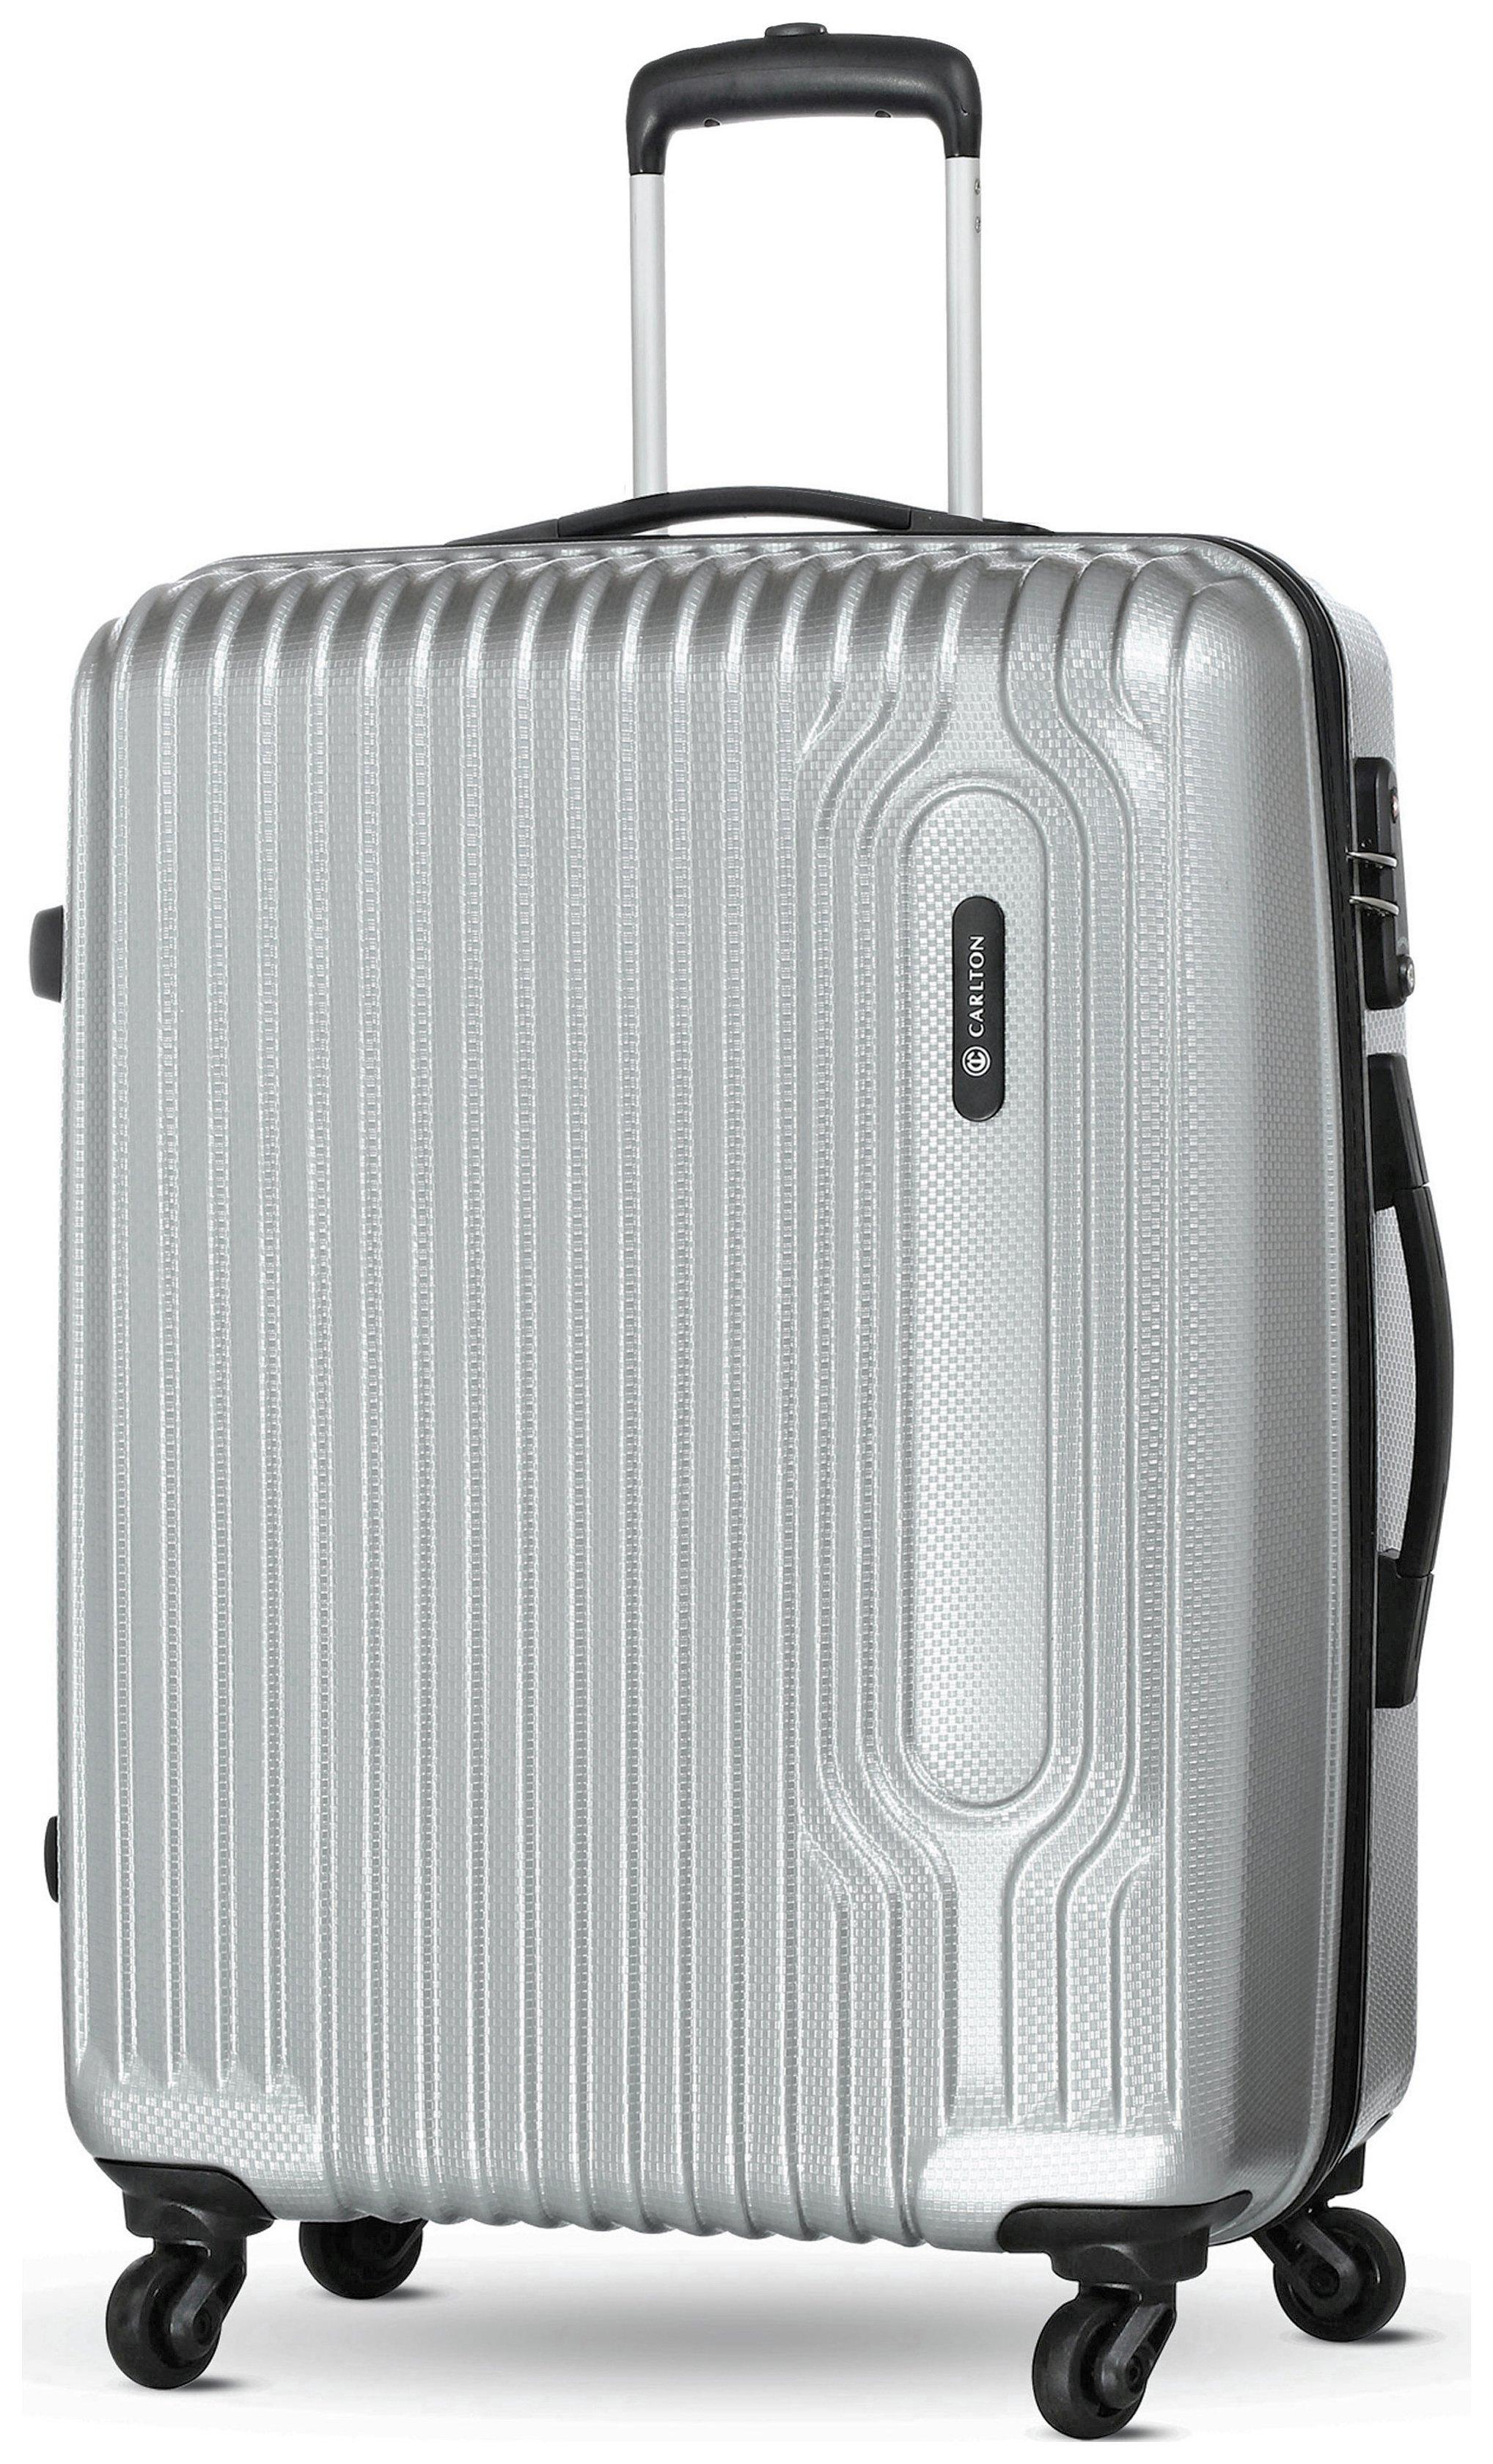 Image of Carlton - Tube Large 4 Wheel Hard Suitcase - Silver